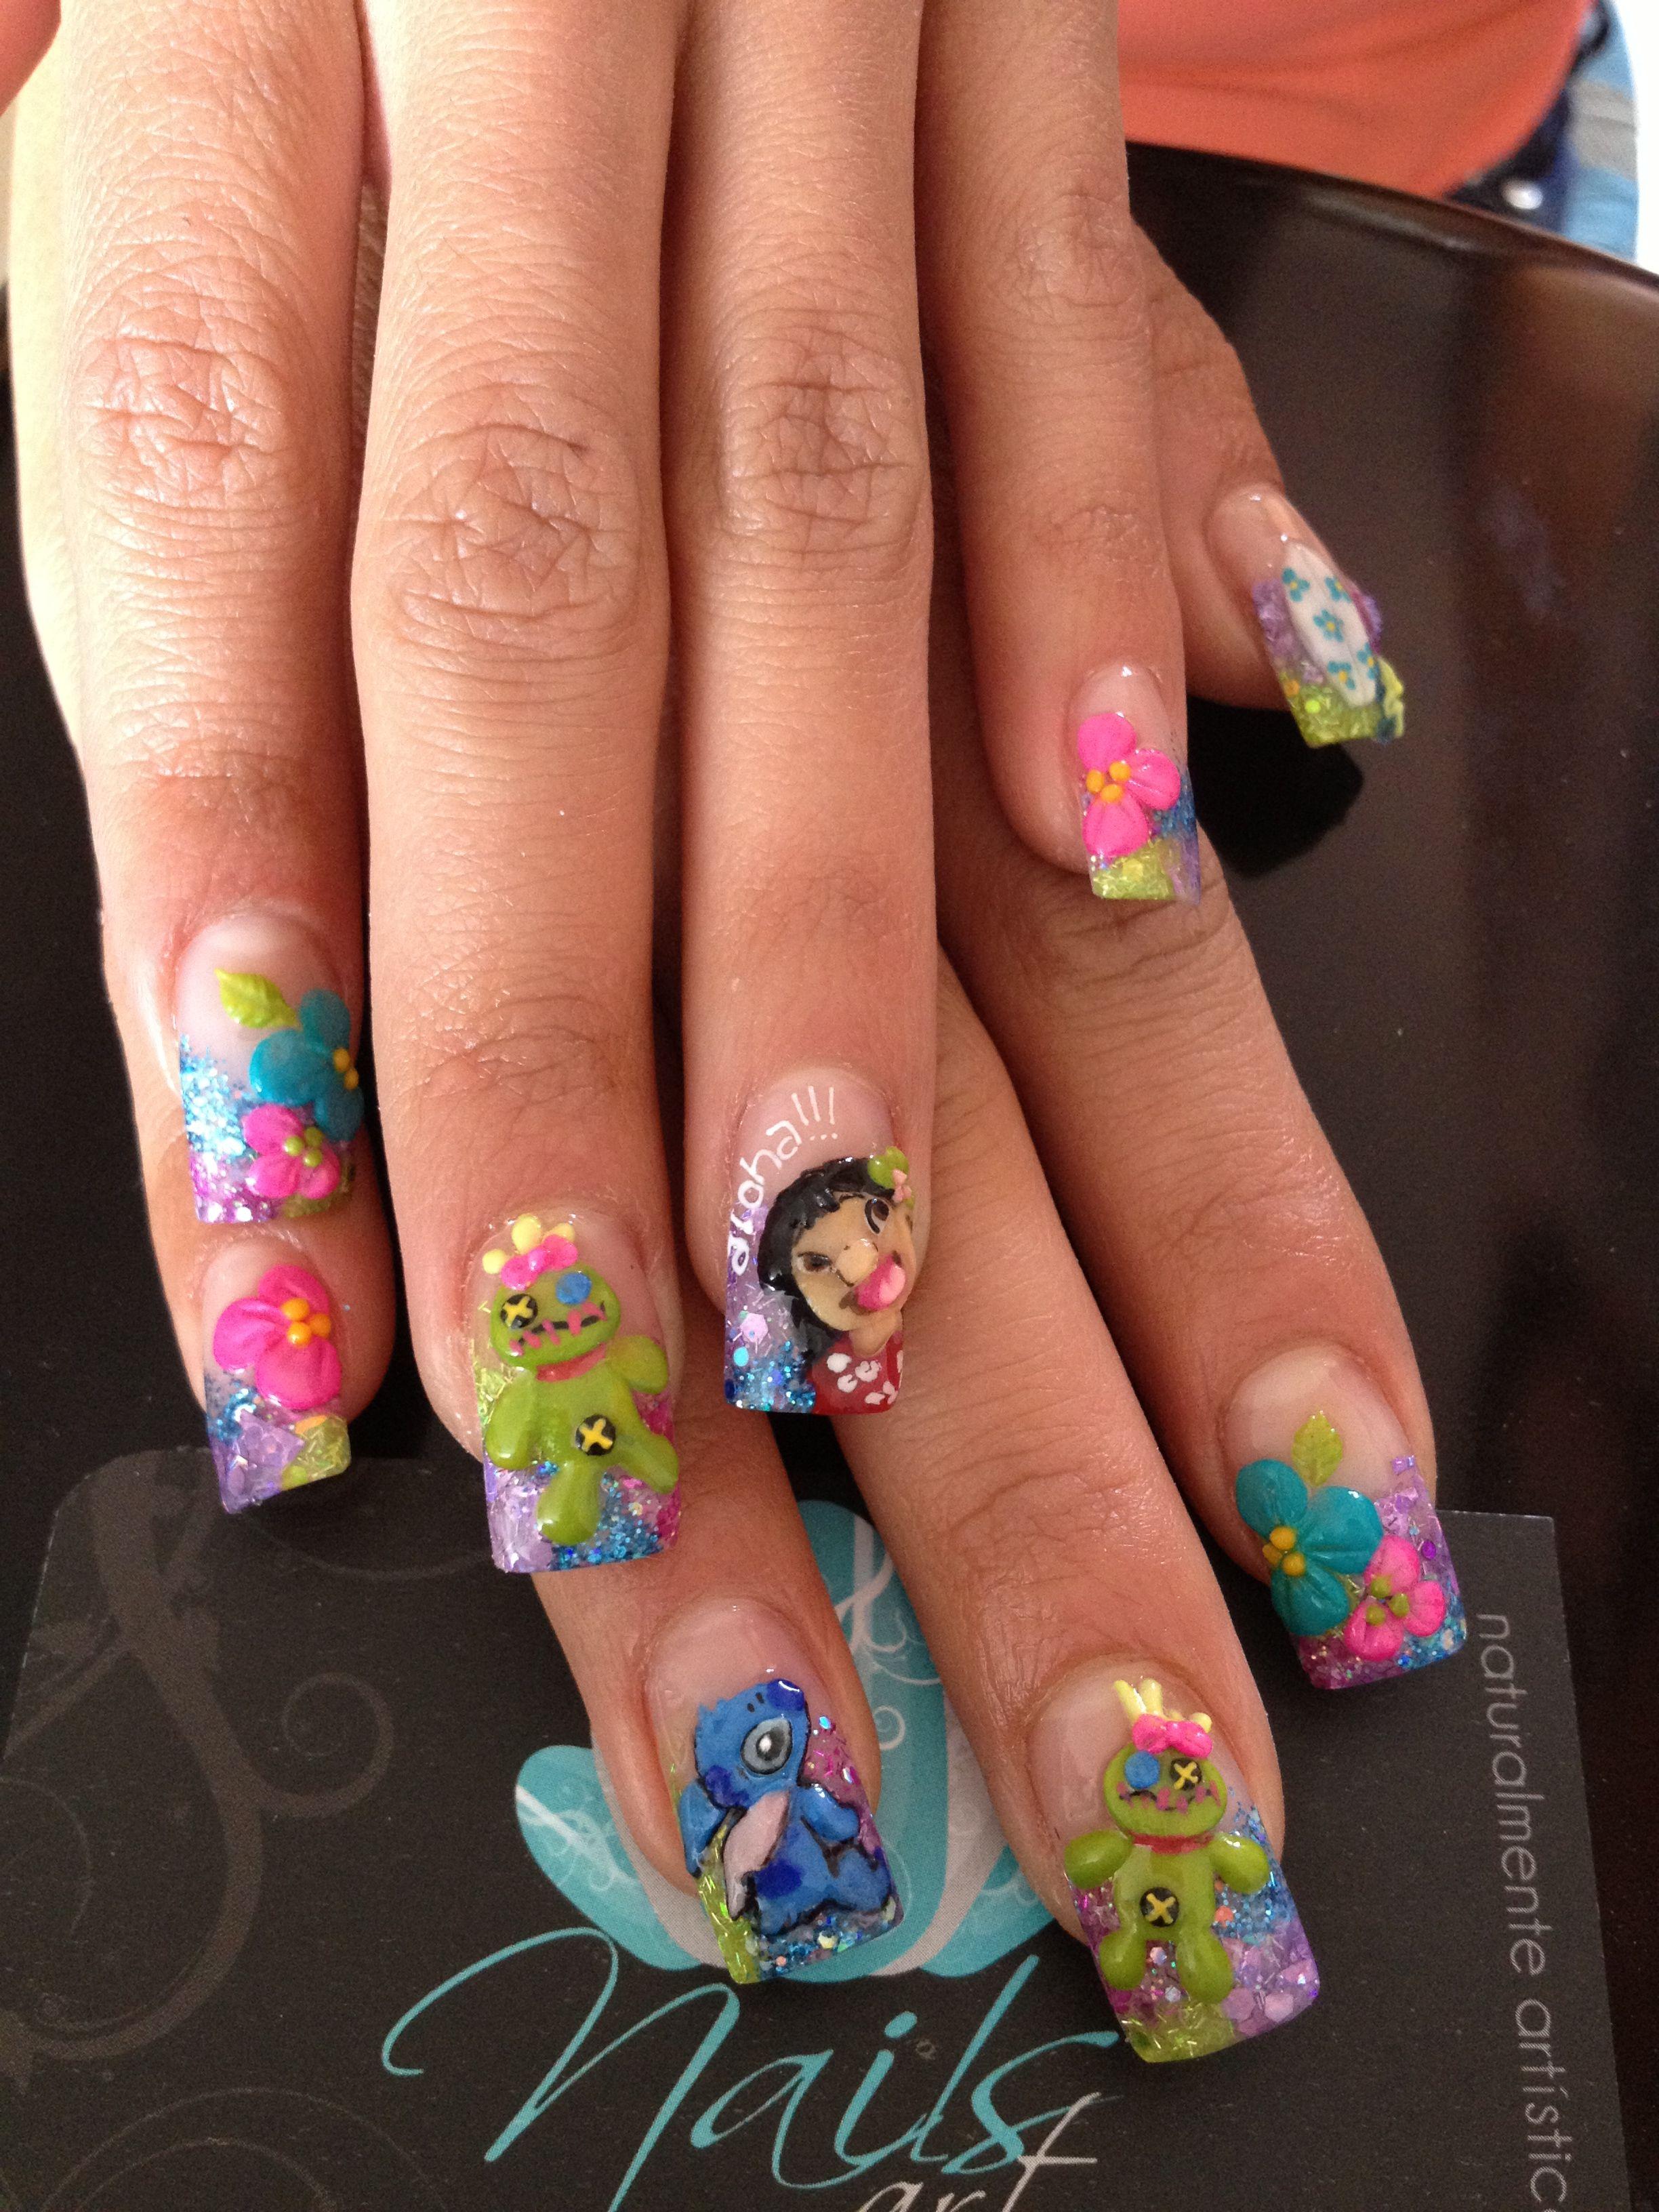 Nails art, lilo & stitch | STITCH!! | Pinterest | Nageldesign